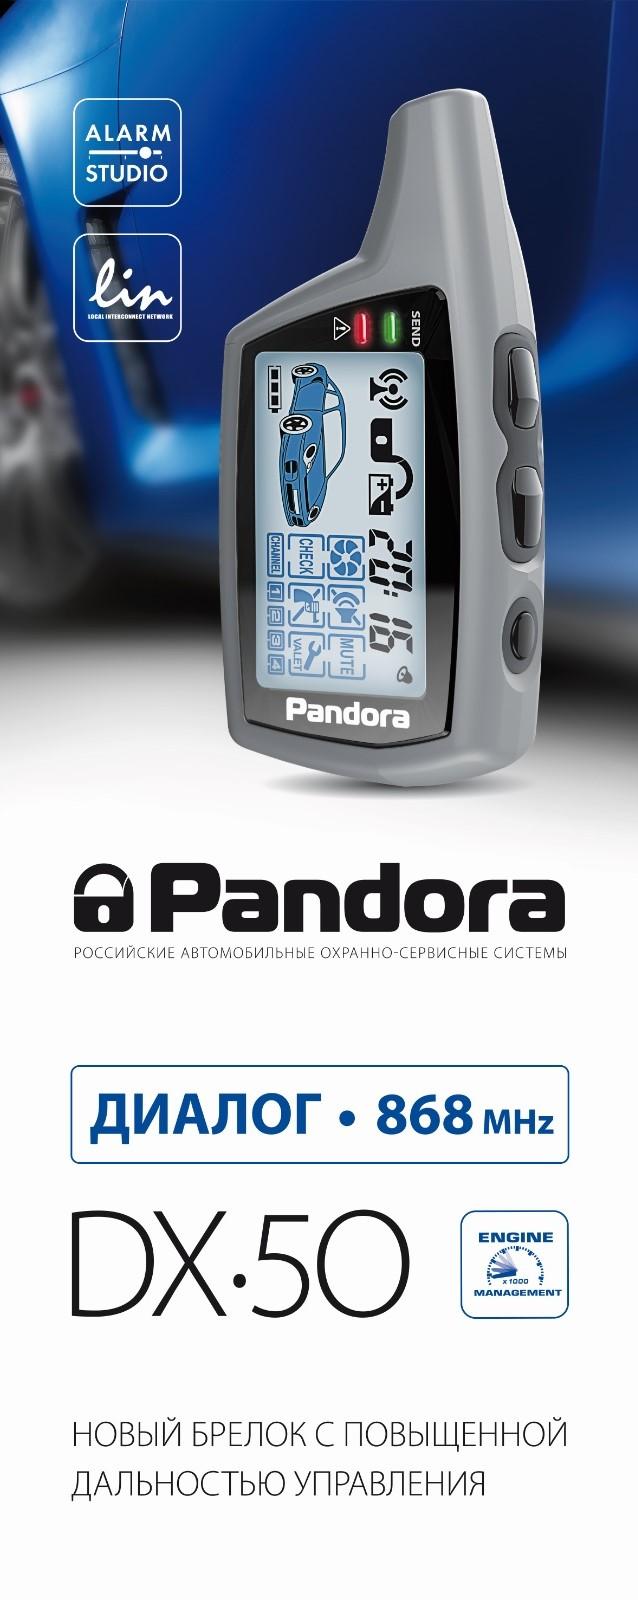 http://autostudio.ru/images/30106.jpg